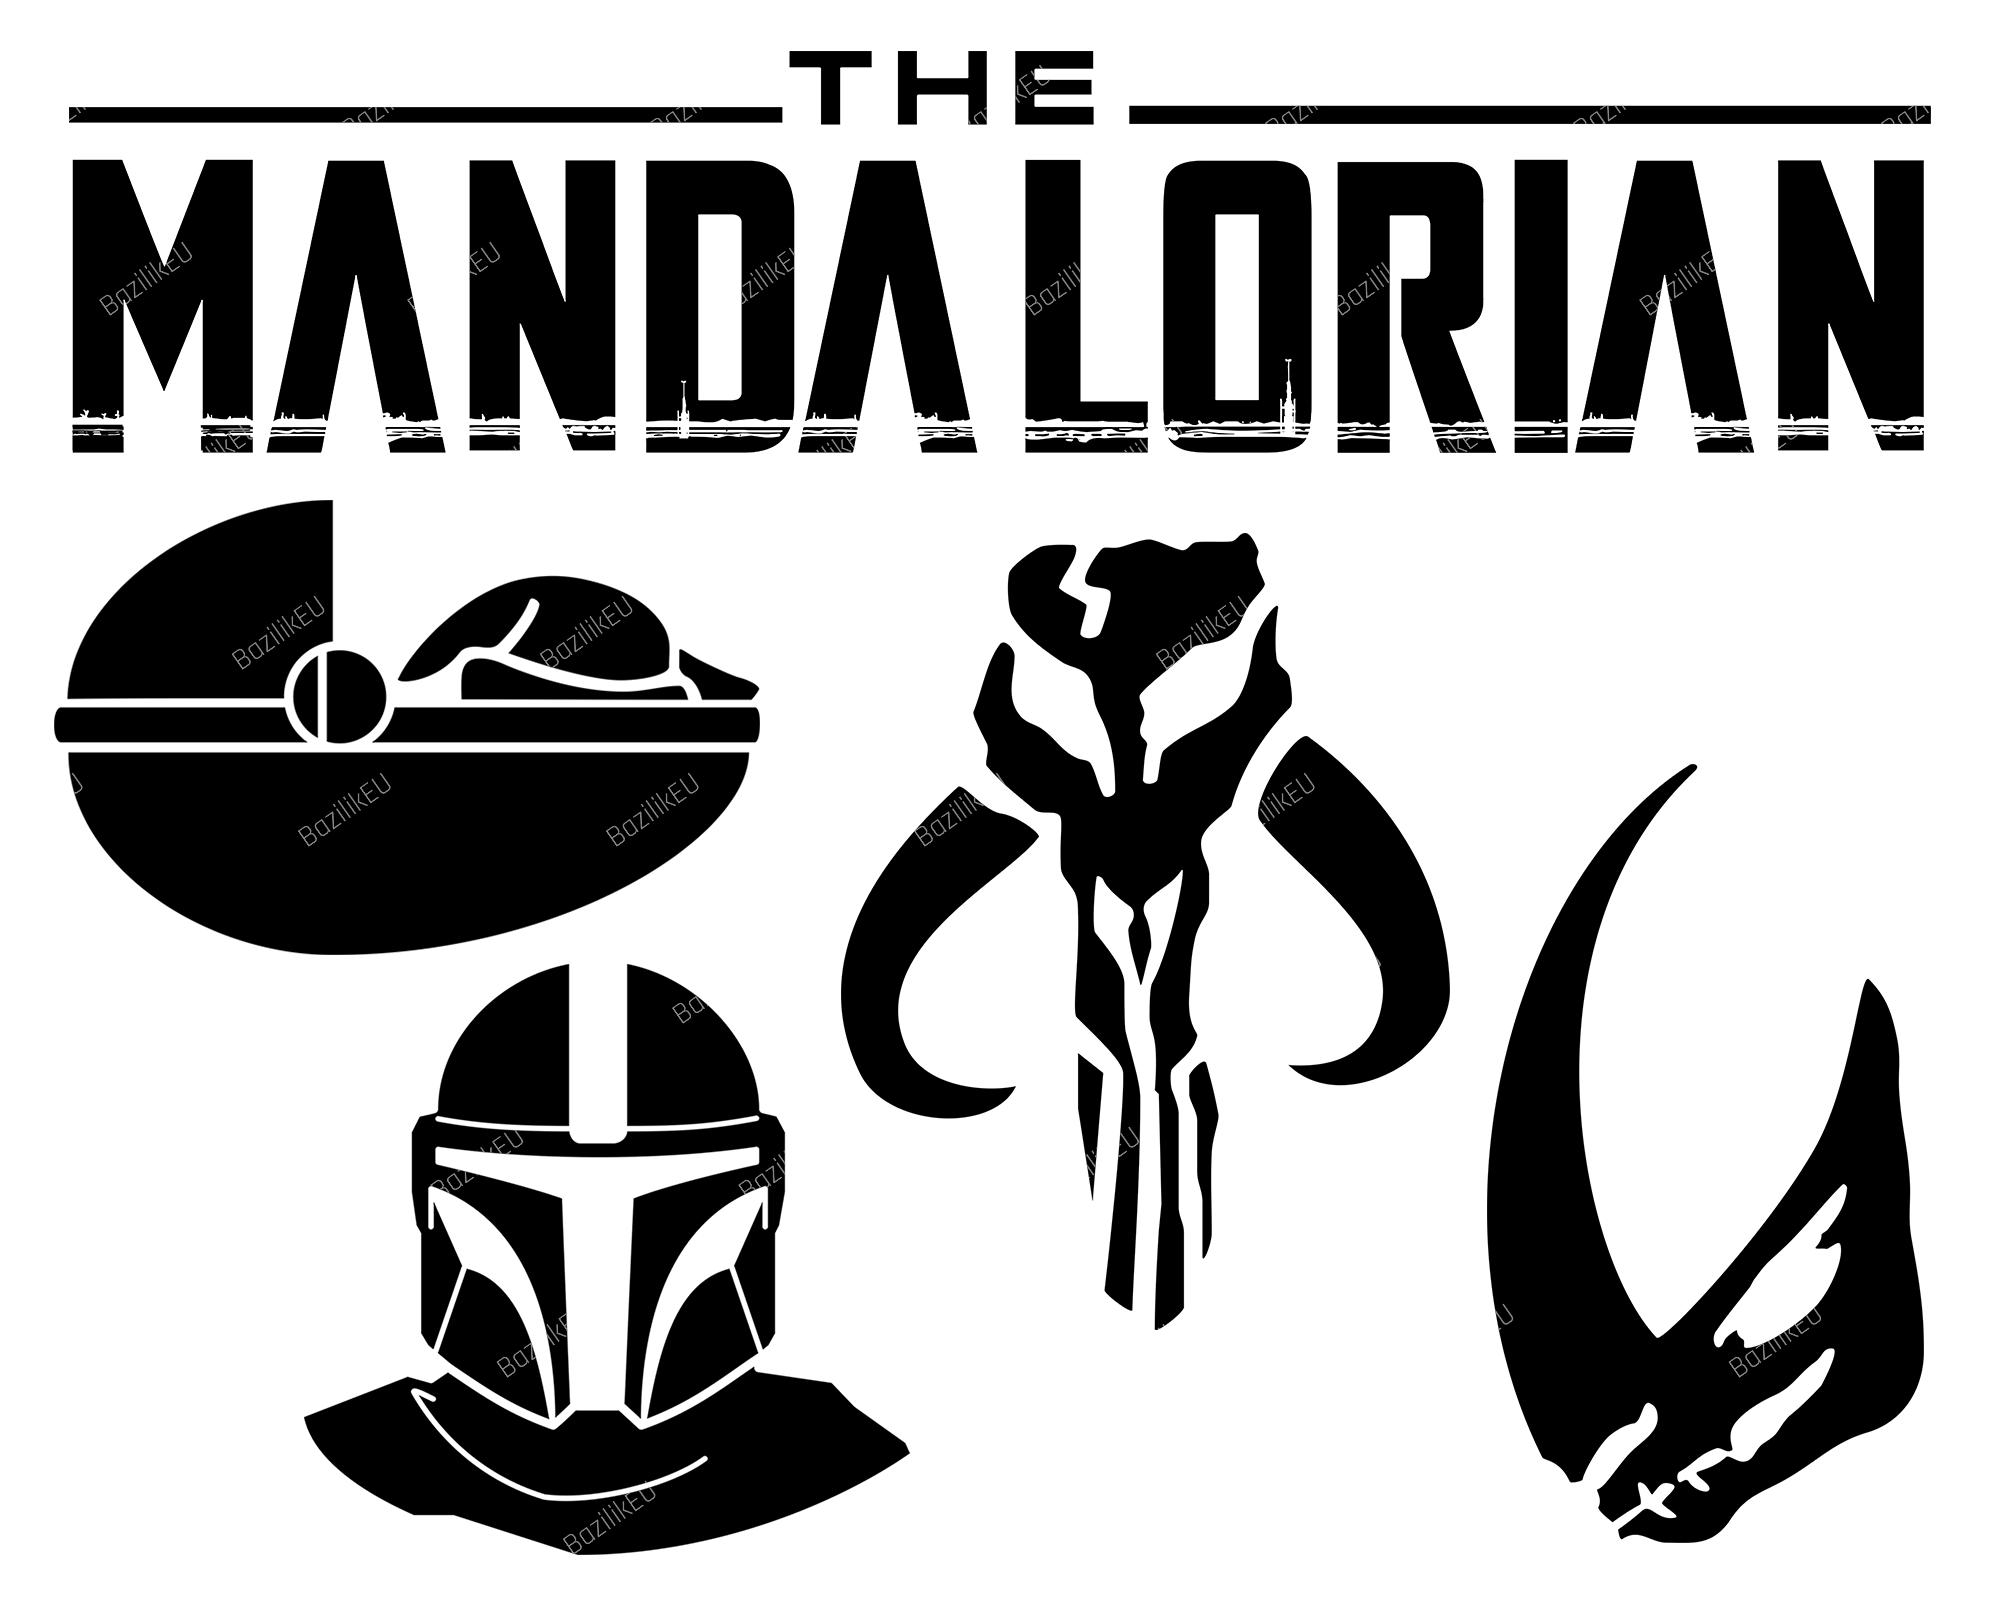 Star Wars Mandalorian Svg Bundle This Is The Way Svg Bundle Etsy In 2021 Star Wars Silhouette Star Wars Prints Star Wars Stencil